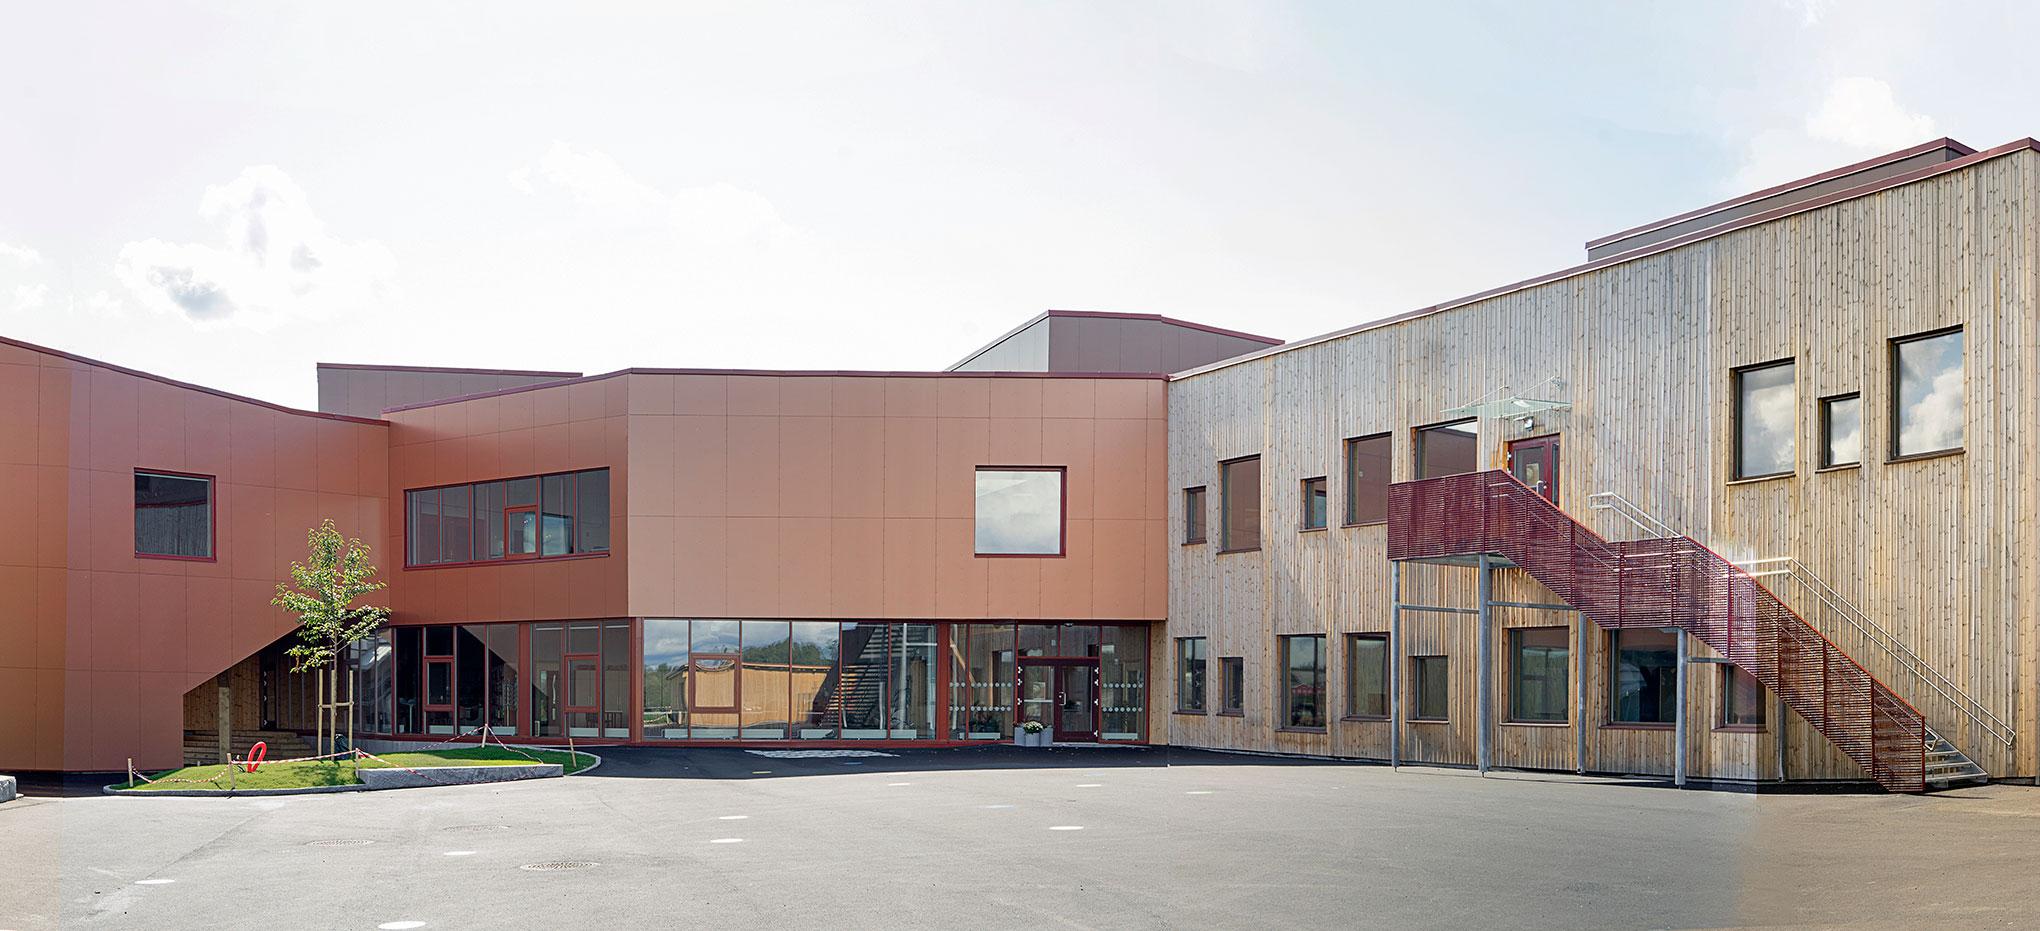 Hebekk-skole_Panorama_resize2